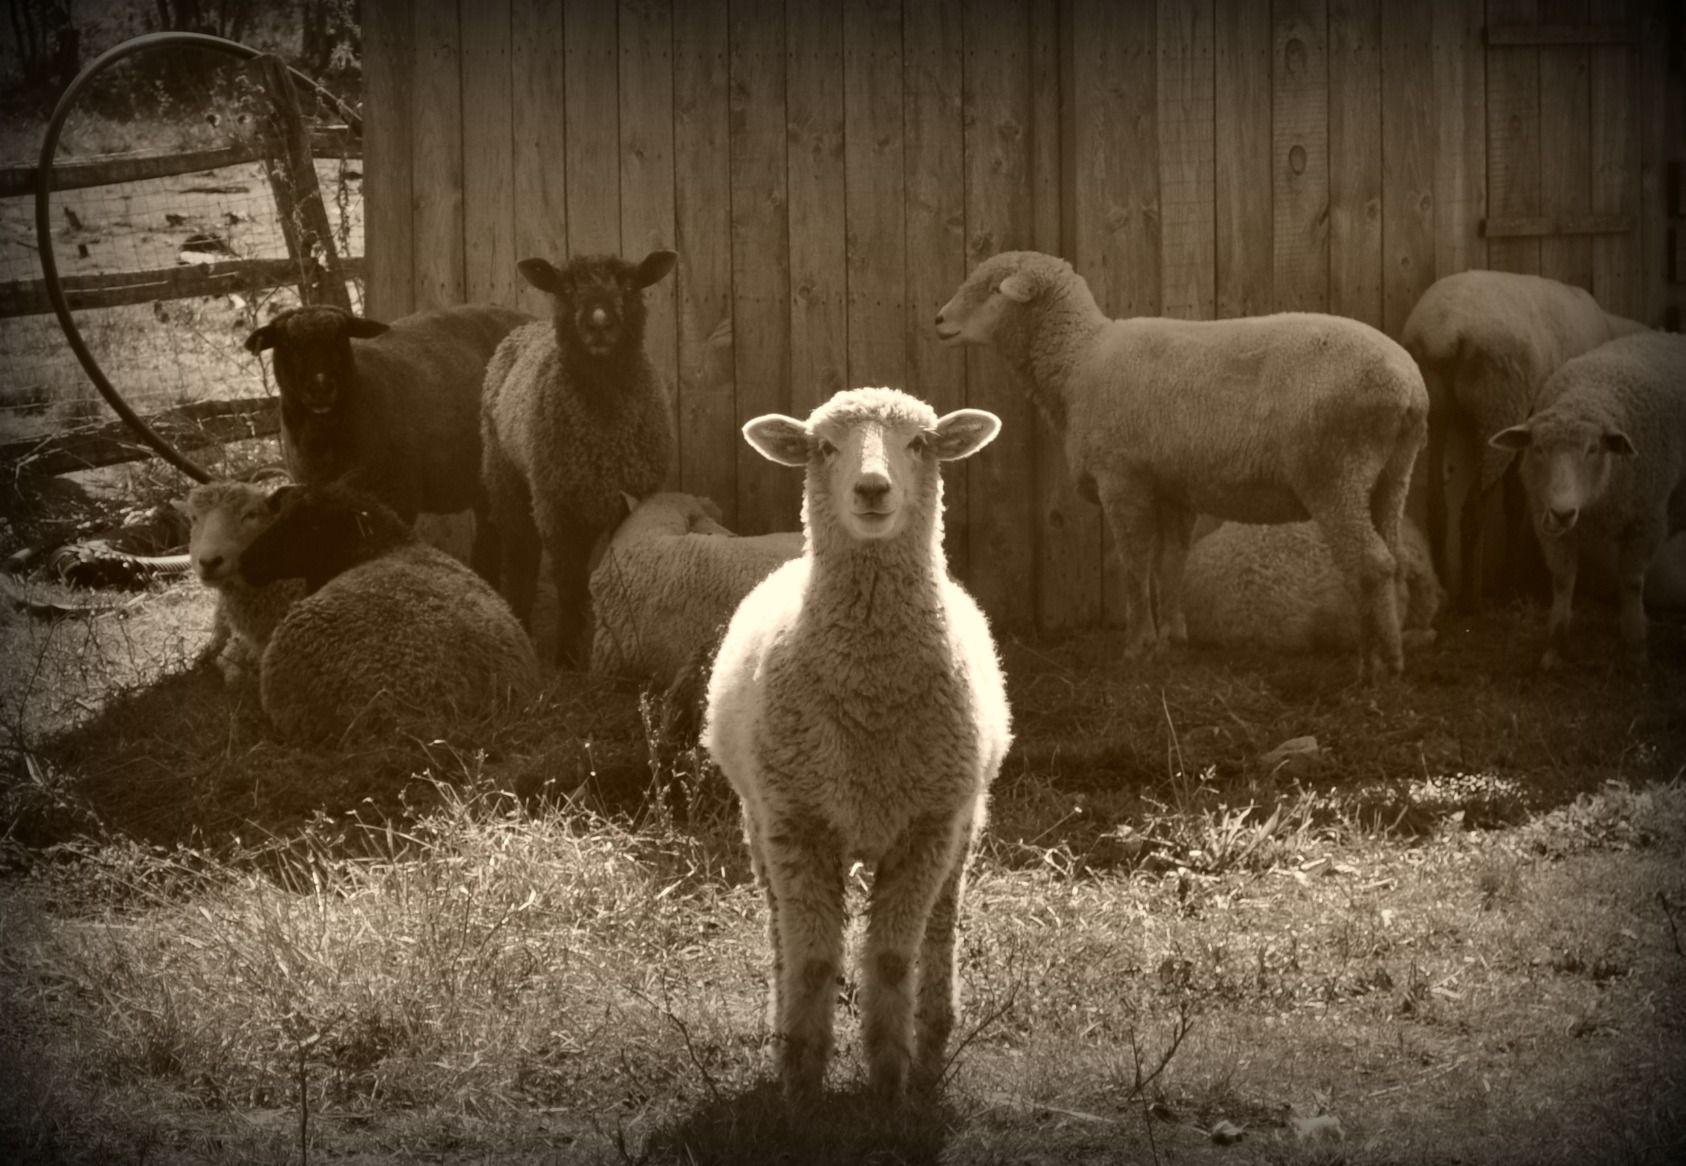 a-shiny-sheep.jpg (1686×1166)